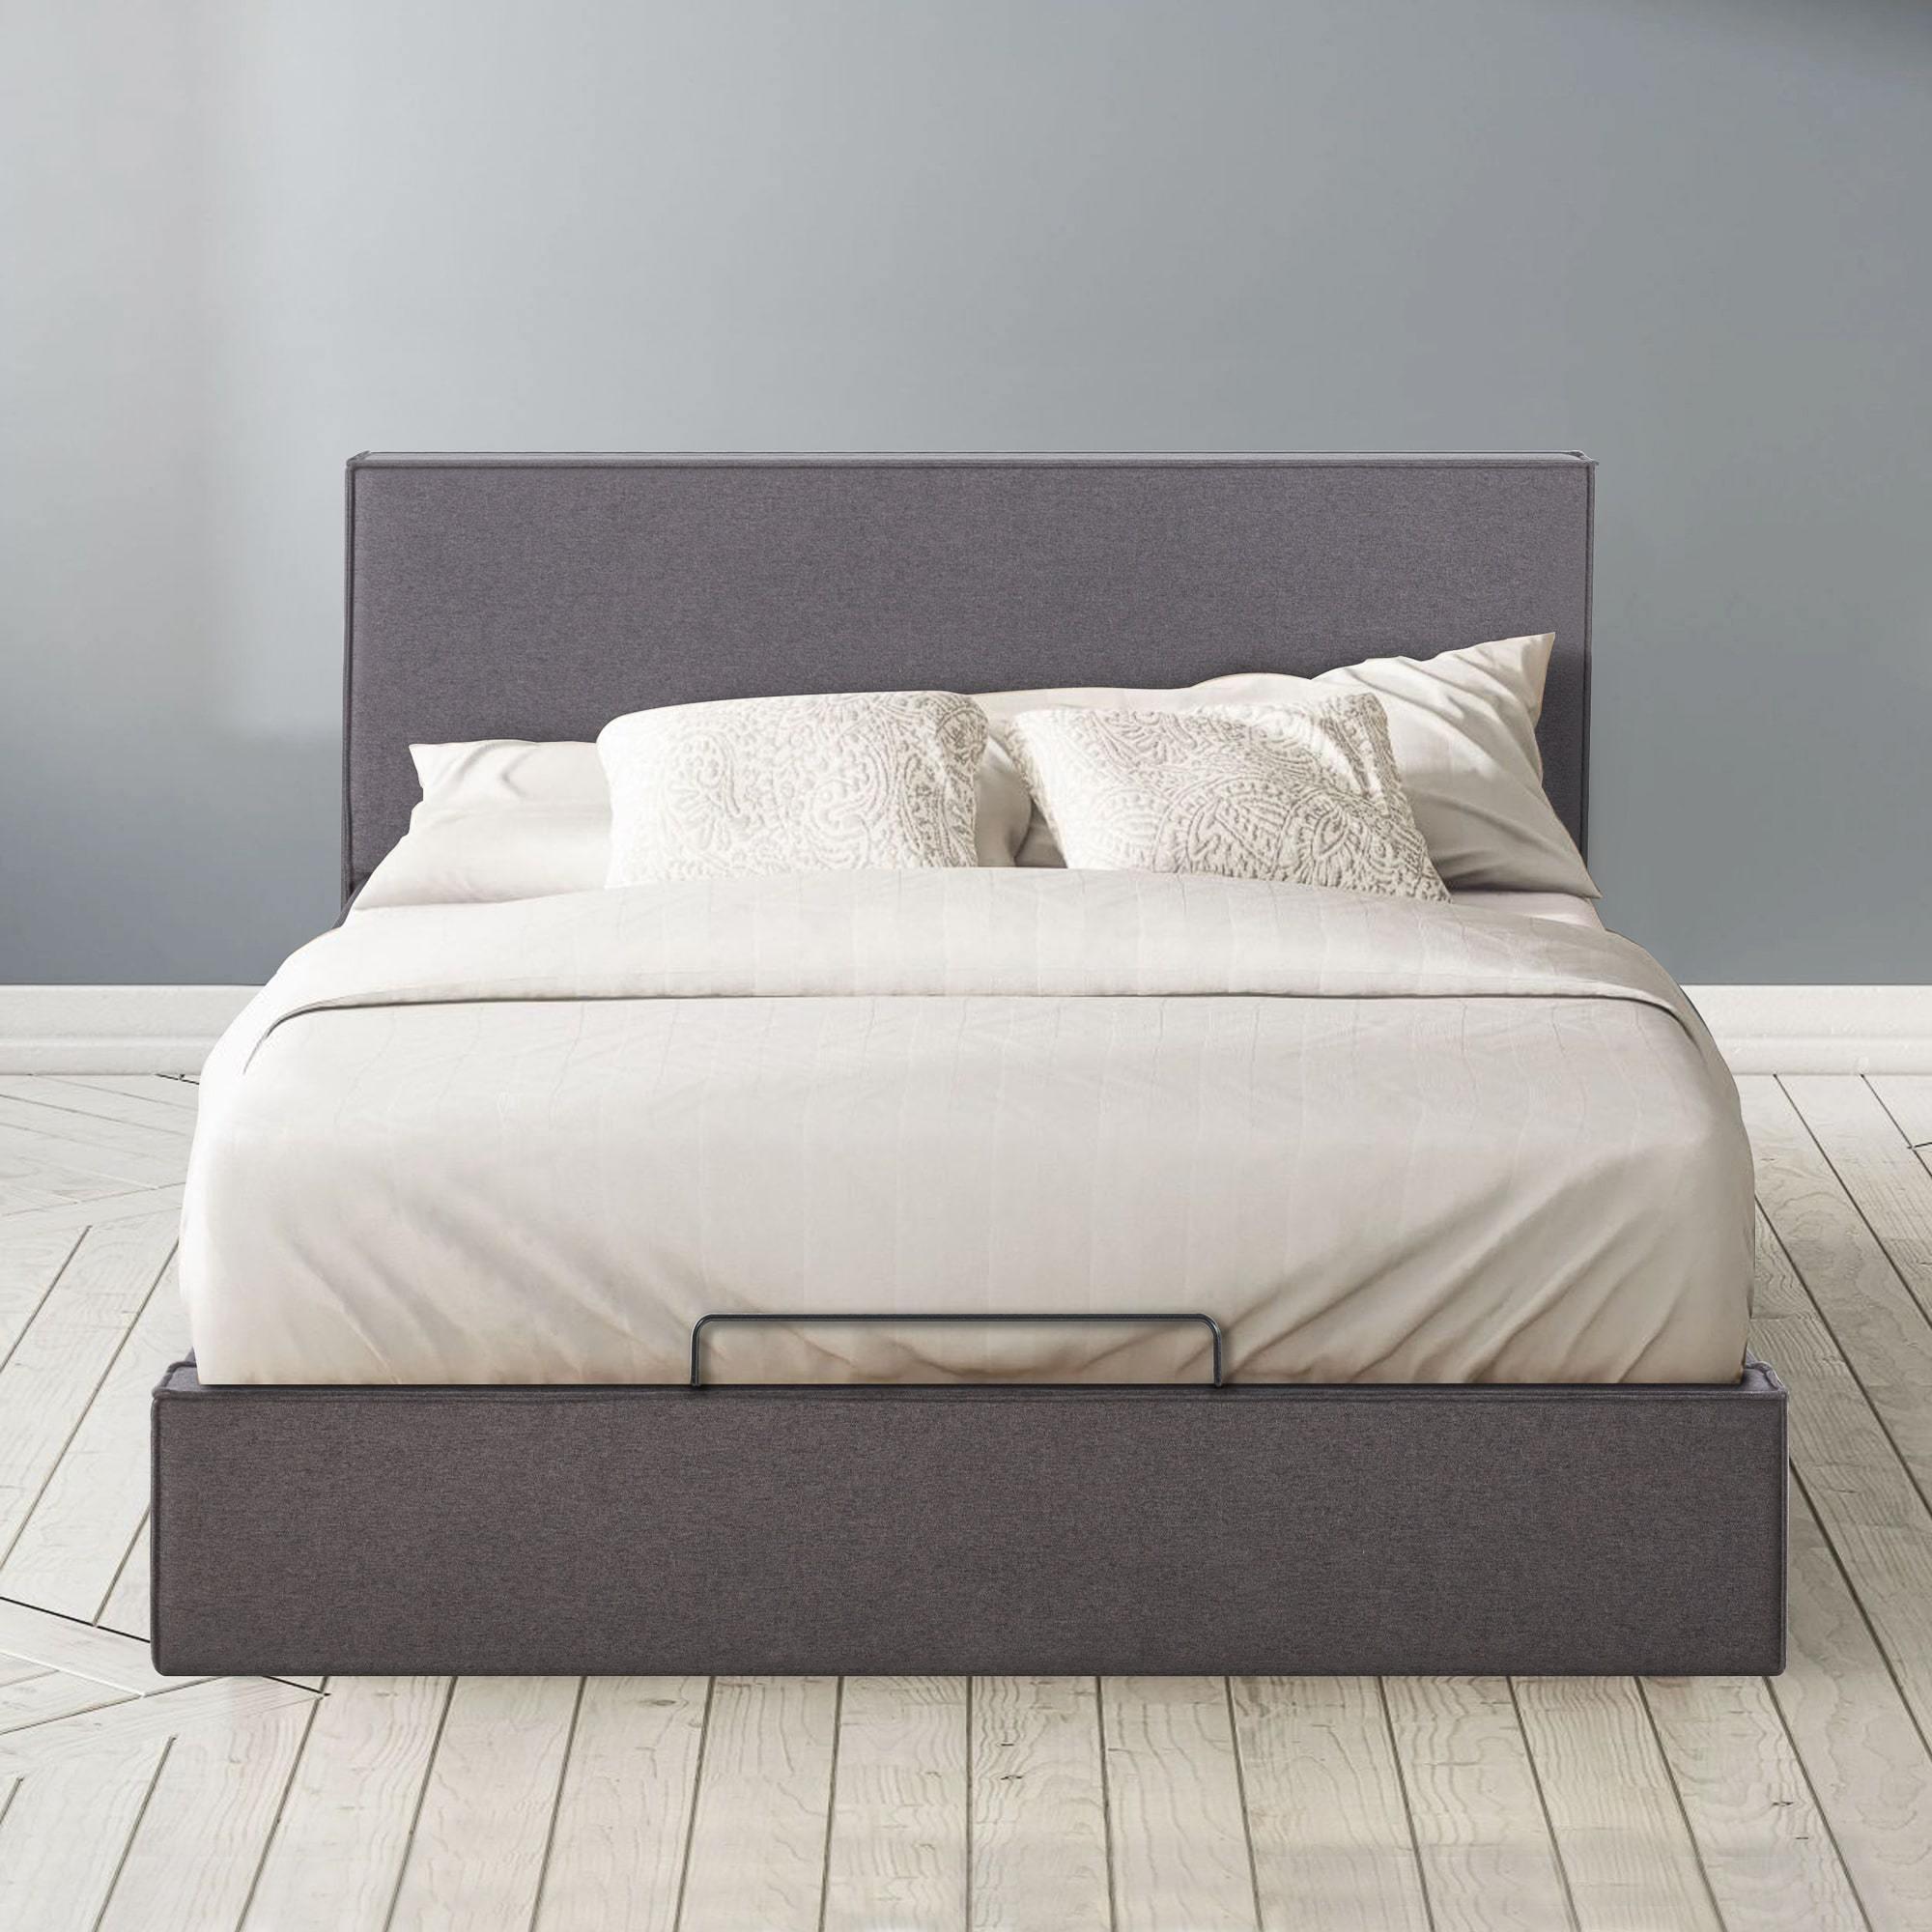 Finley Upholstered Platform Bed Frame with Lifting Storage